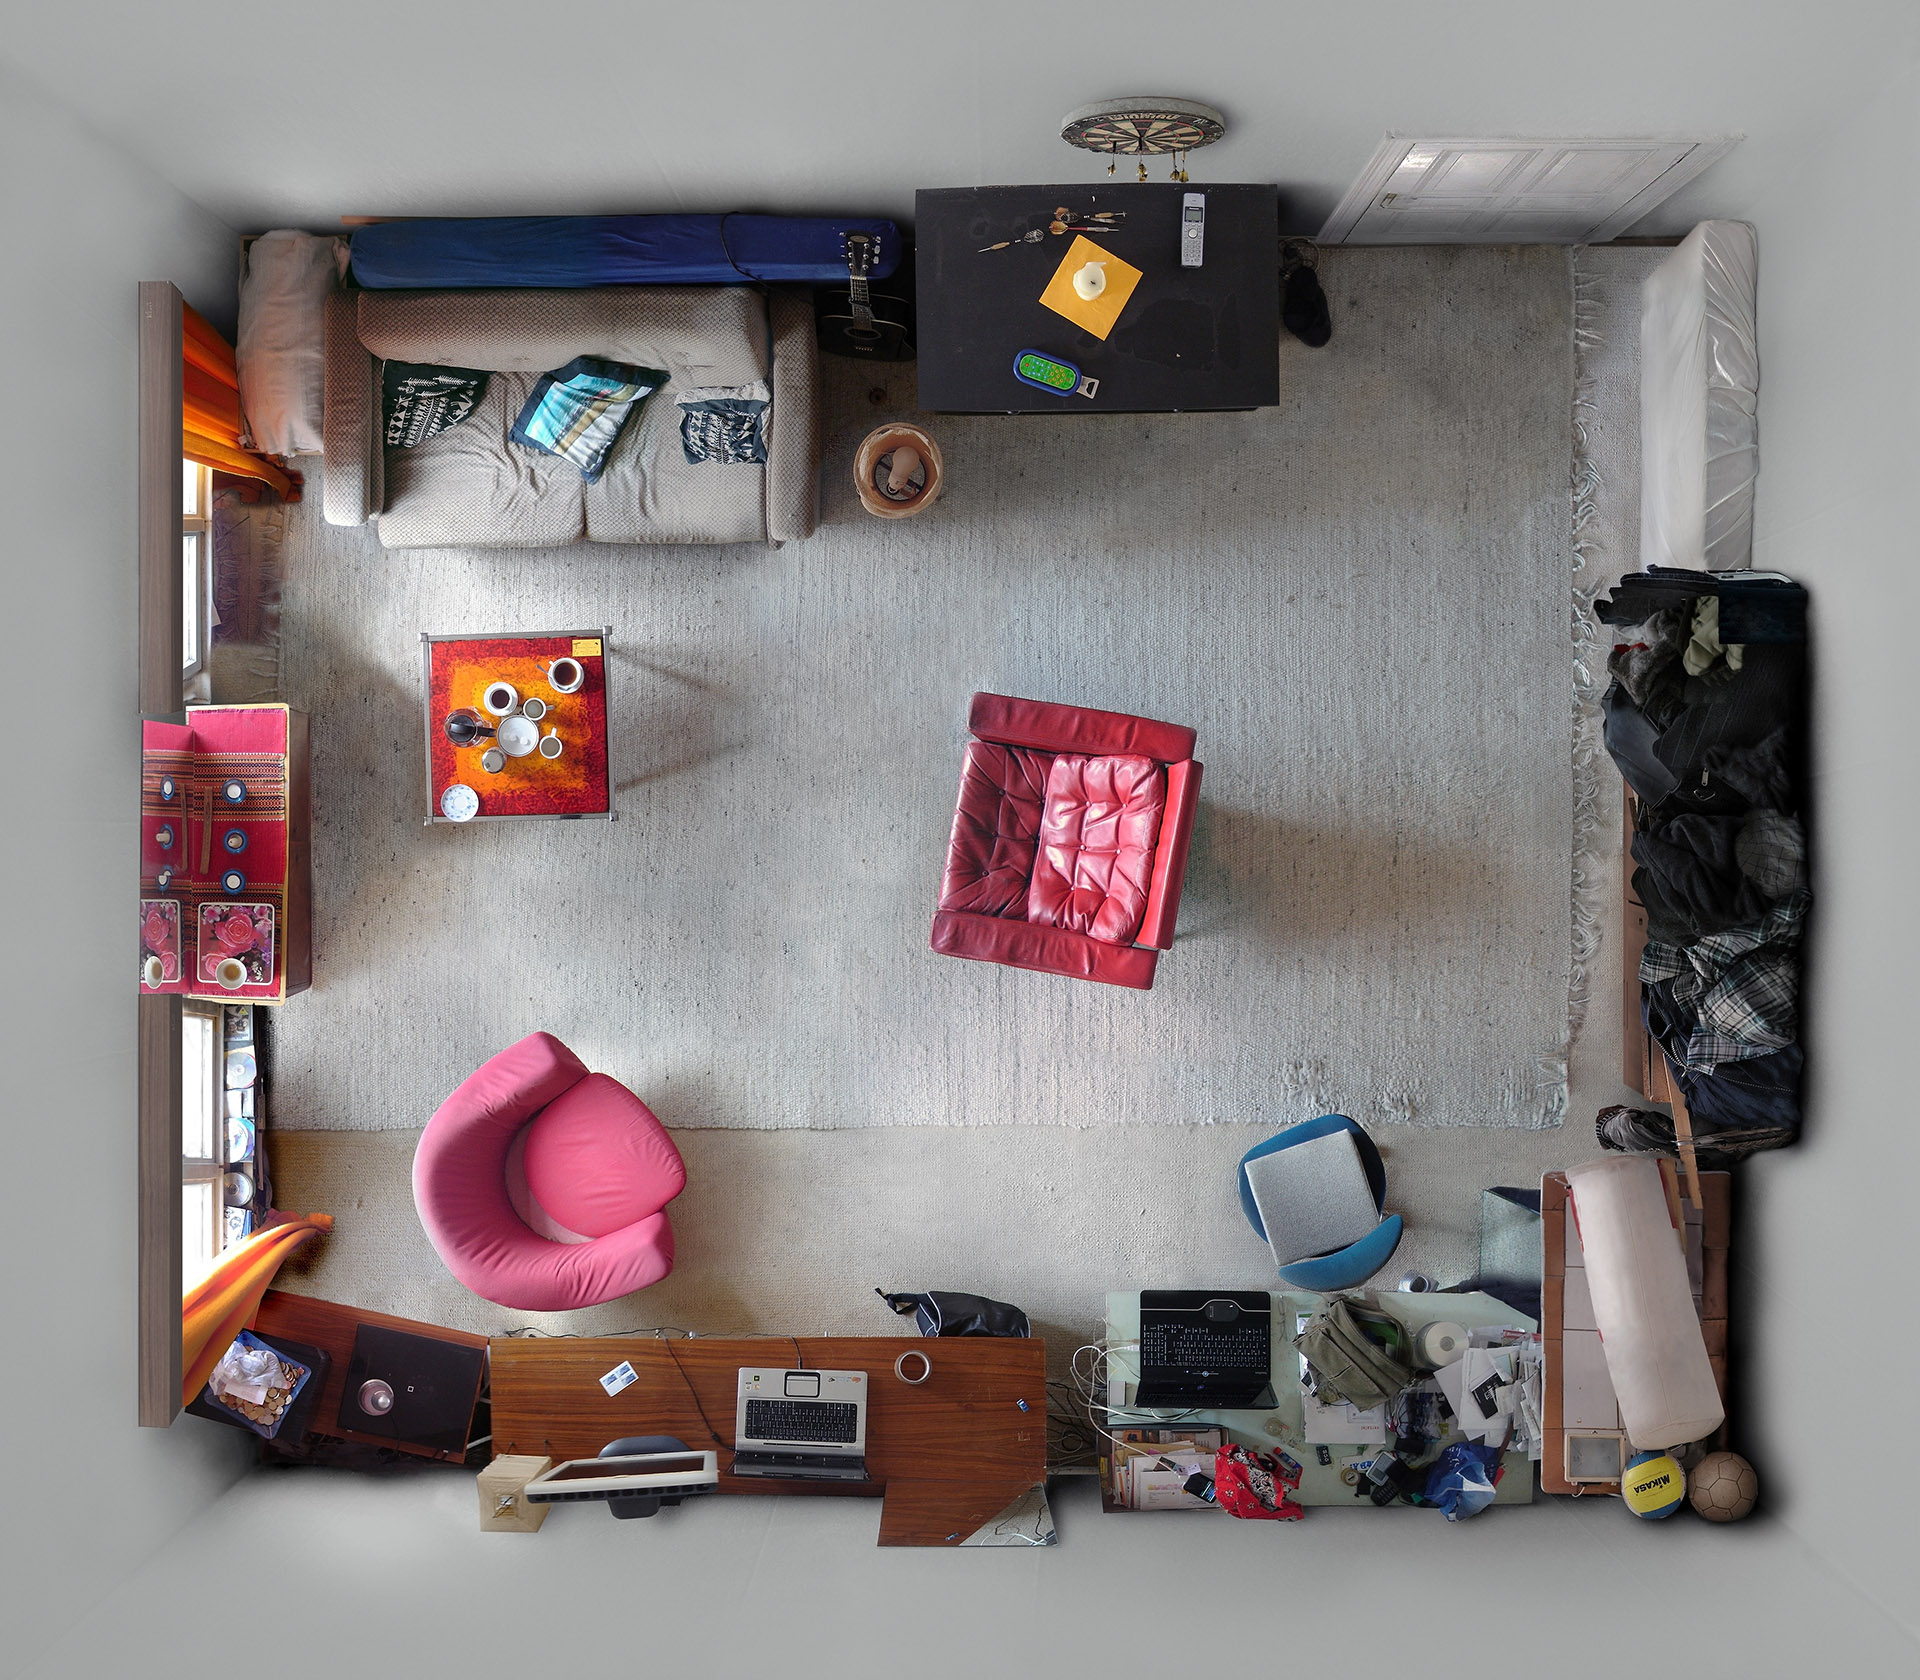 Untitled (M.O.) 2007, 110 x 127 cm (43 x 50 in.)